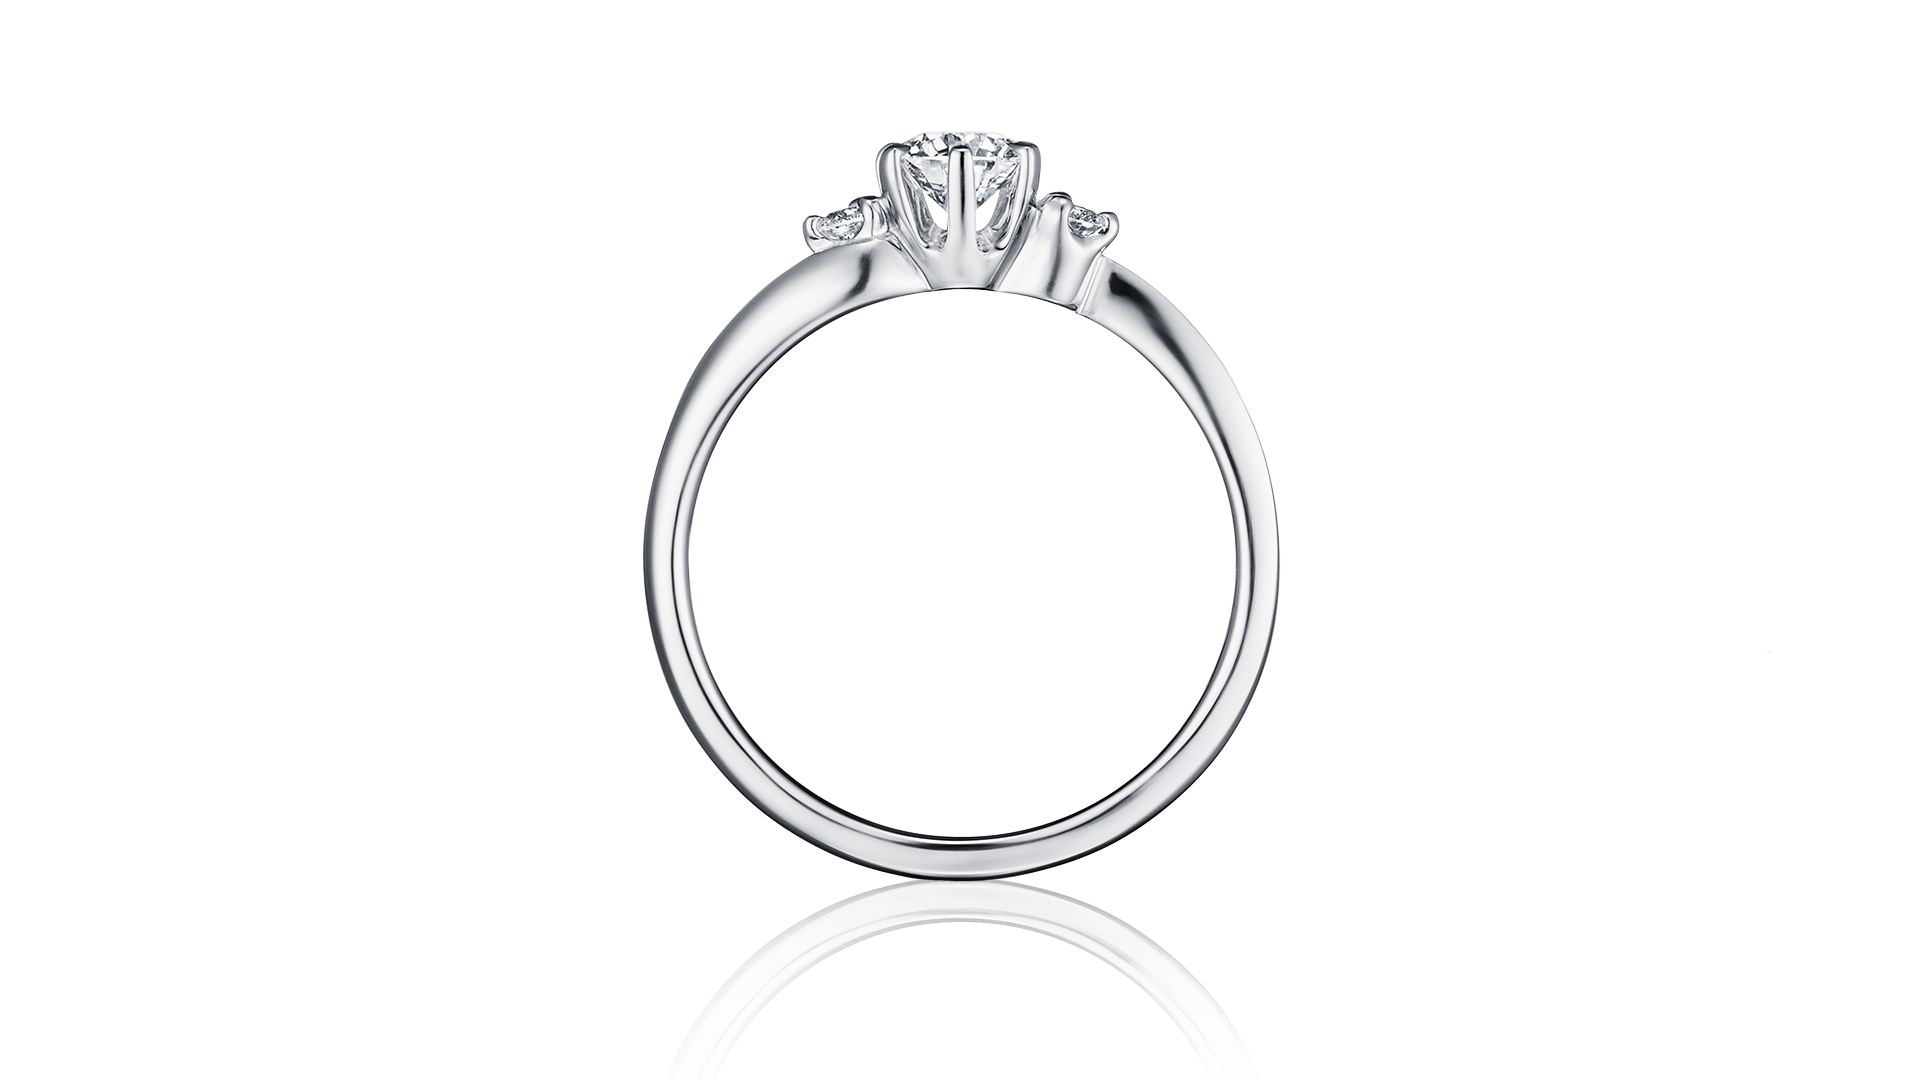 shelia シェリア | 婚約指輪サムネイル 2